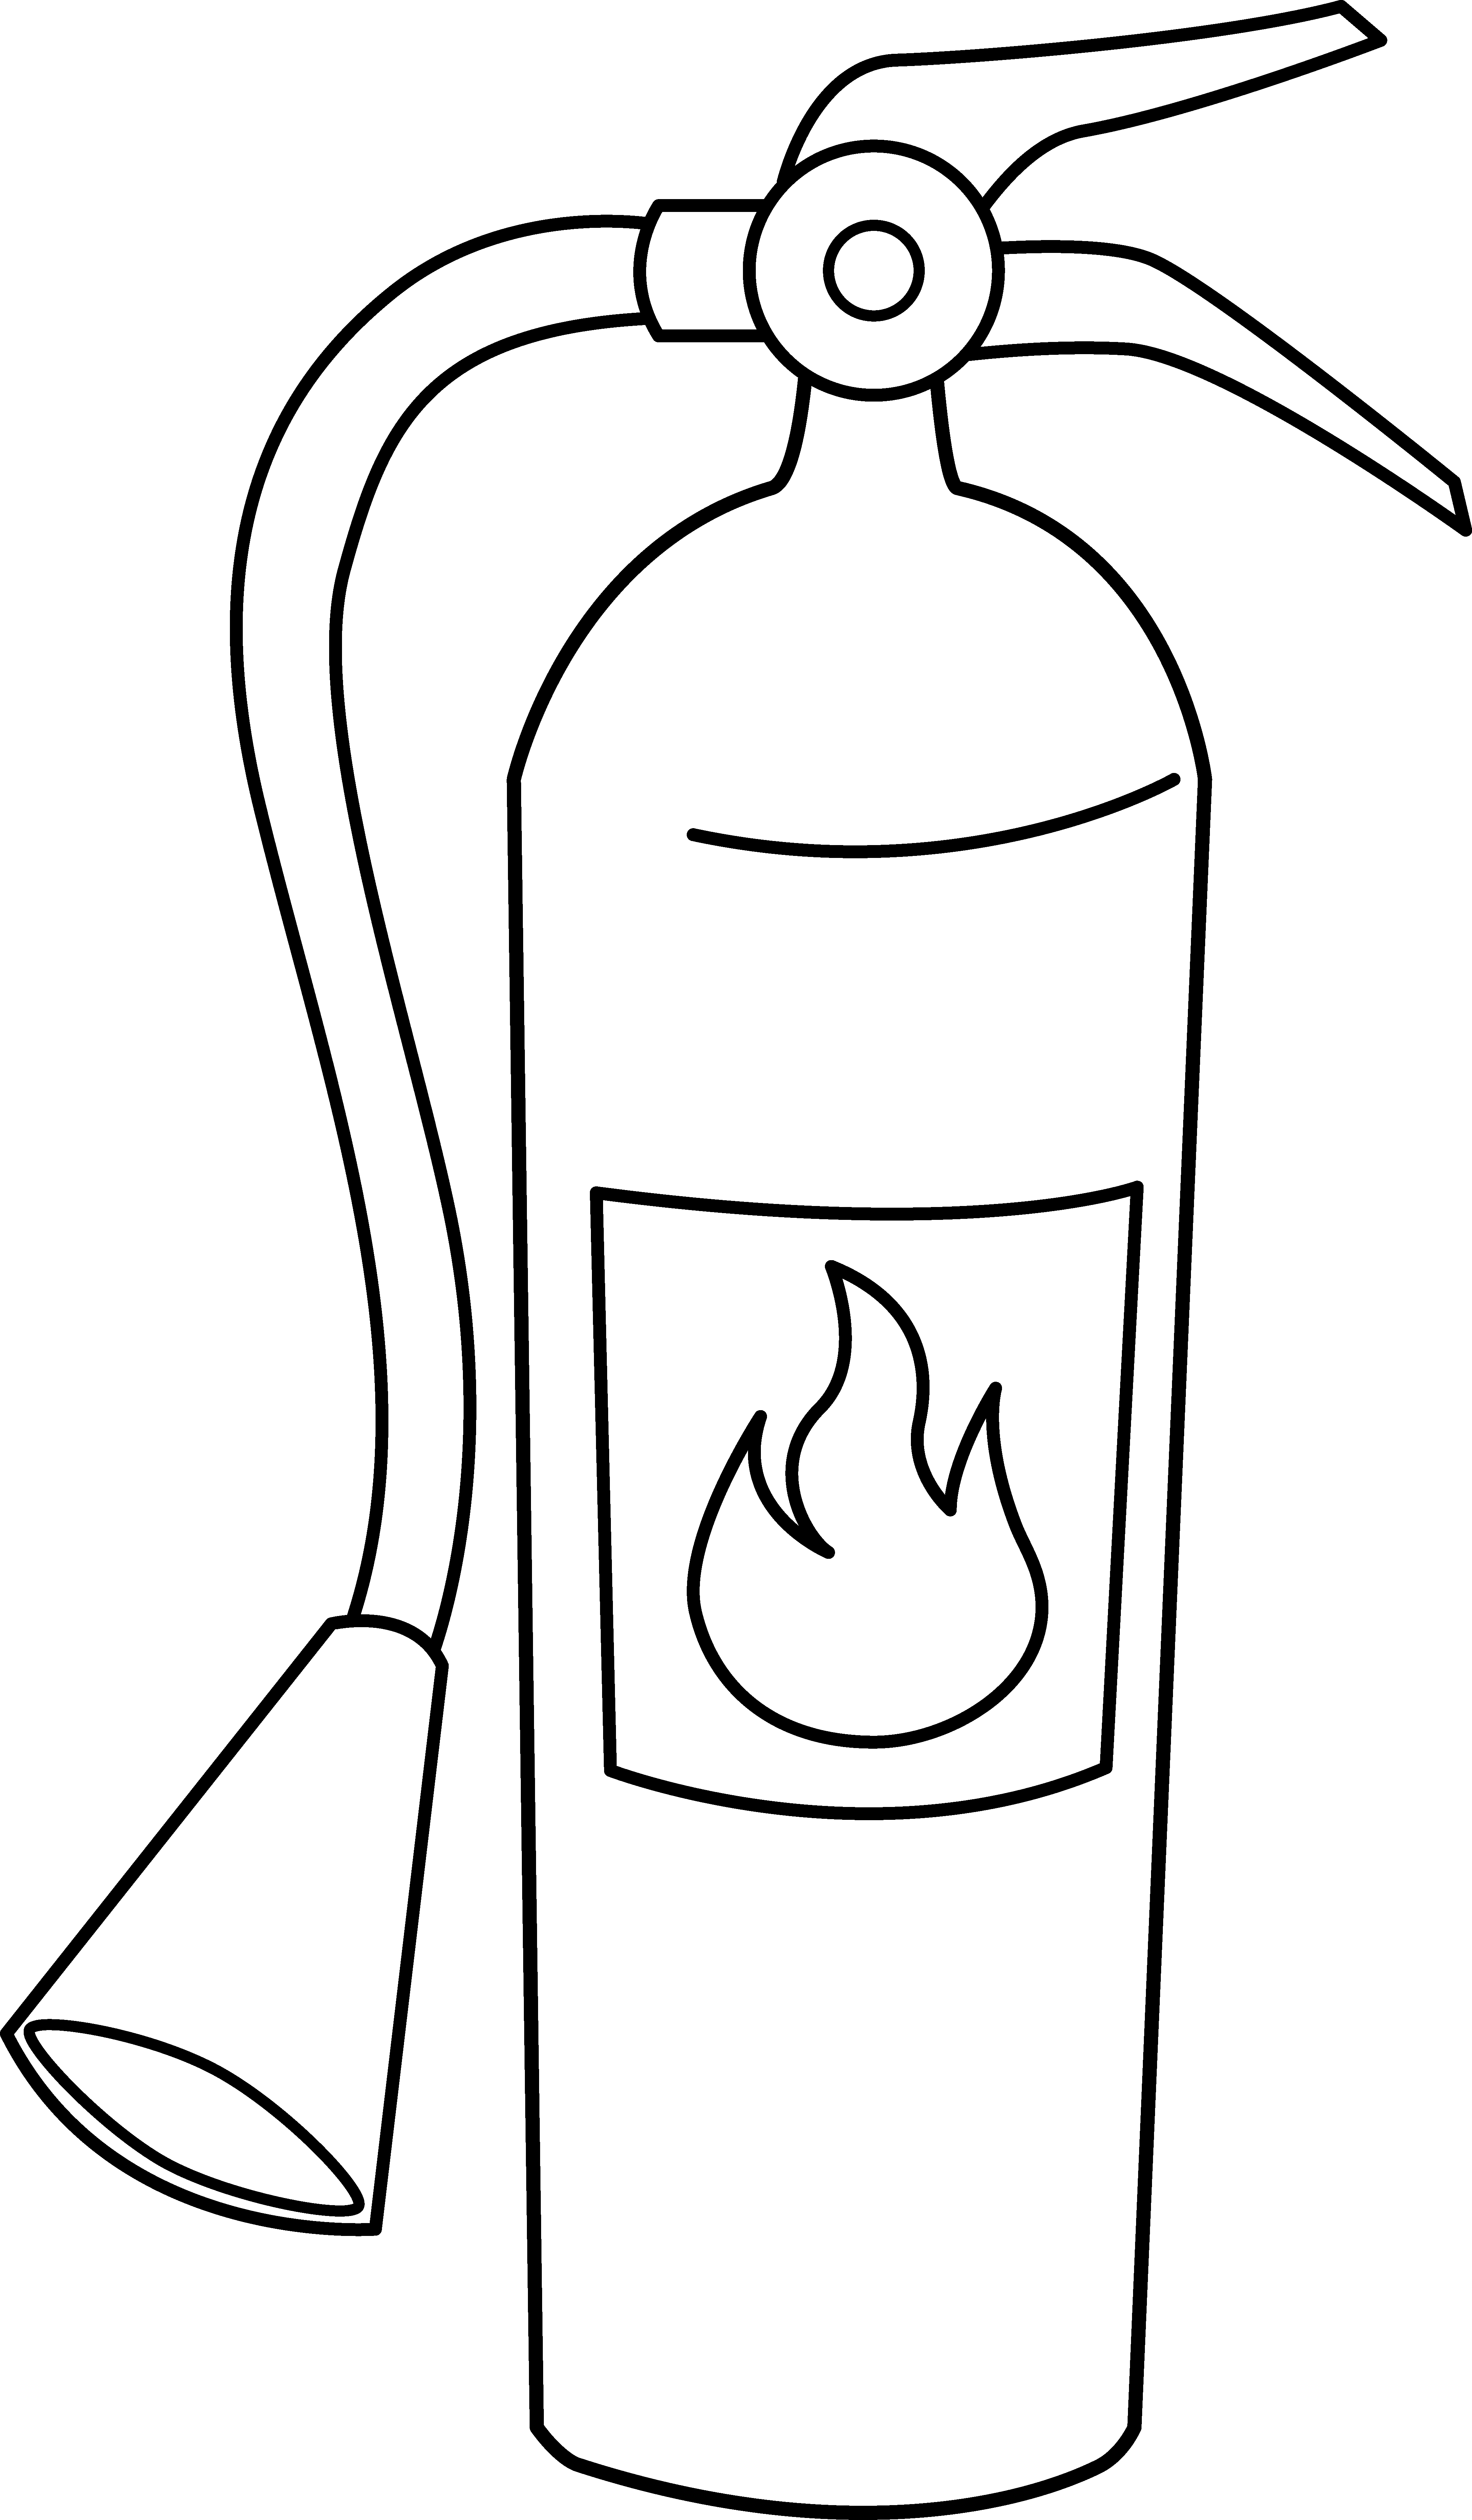 Burning house clipart black and white image freeuse stock Fire Clipart Black And White | Clipart Panda - Free Clipart Images image freeuse stock